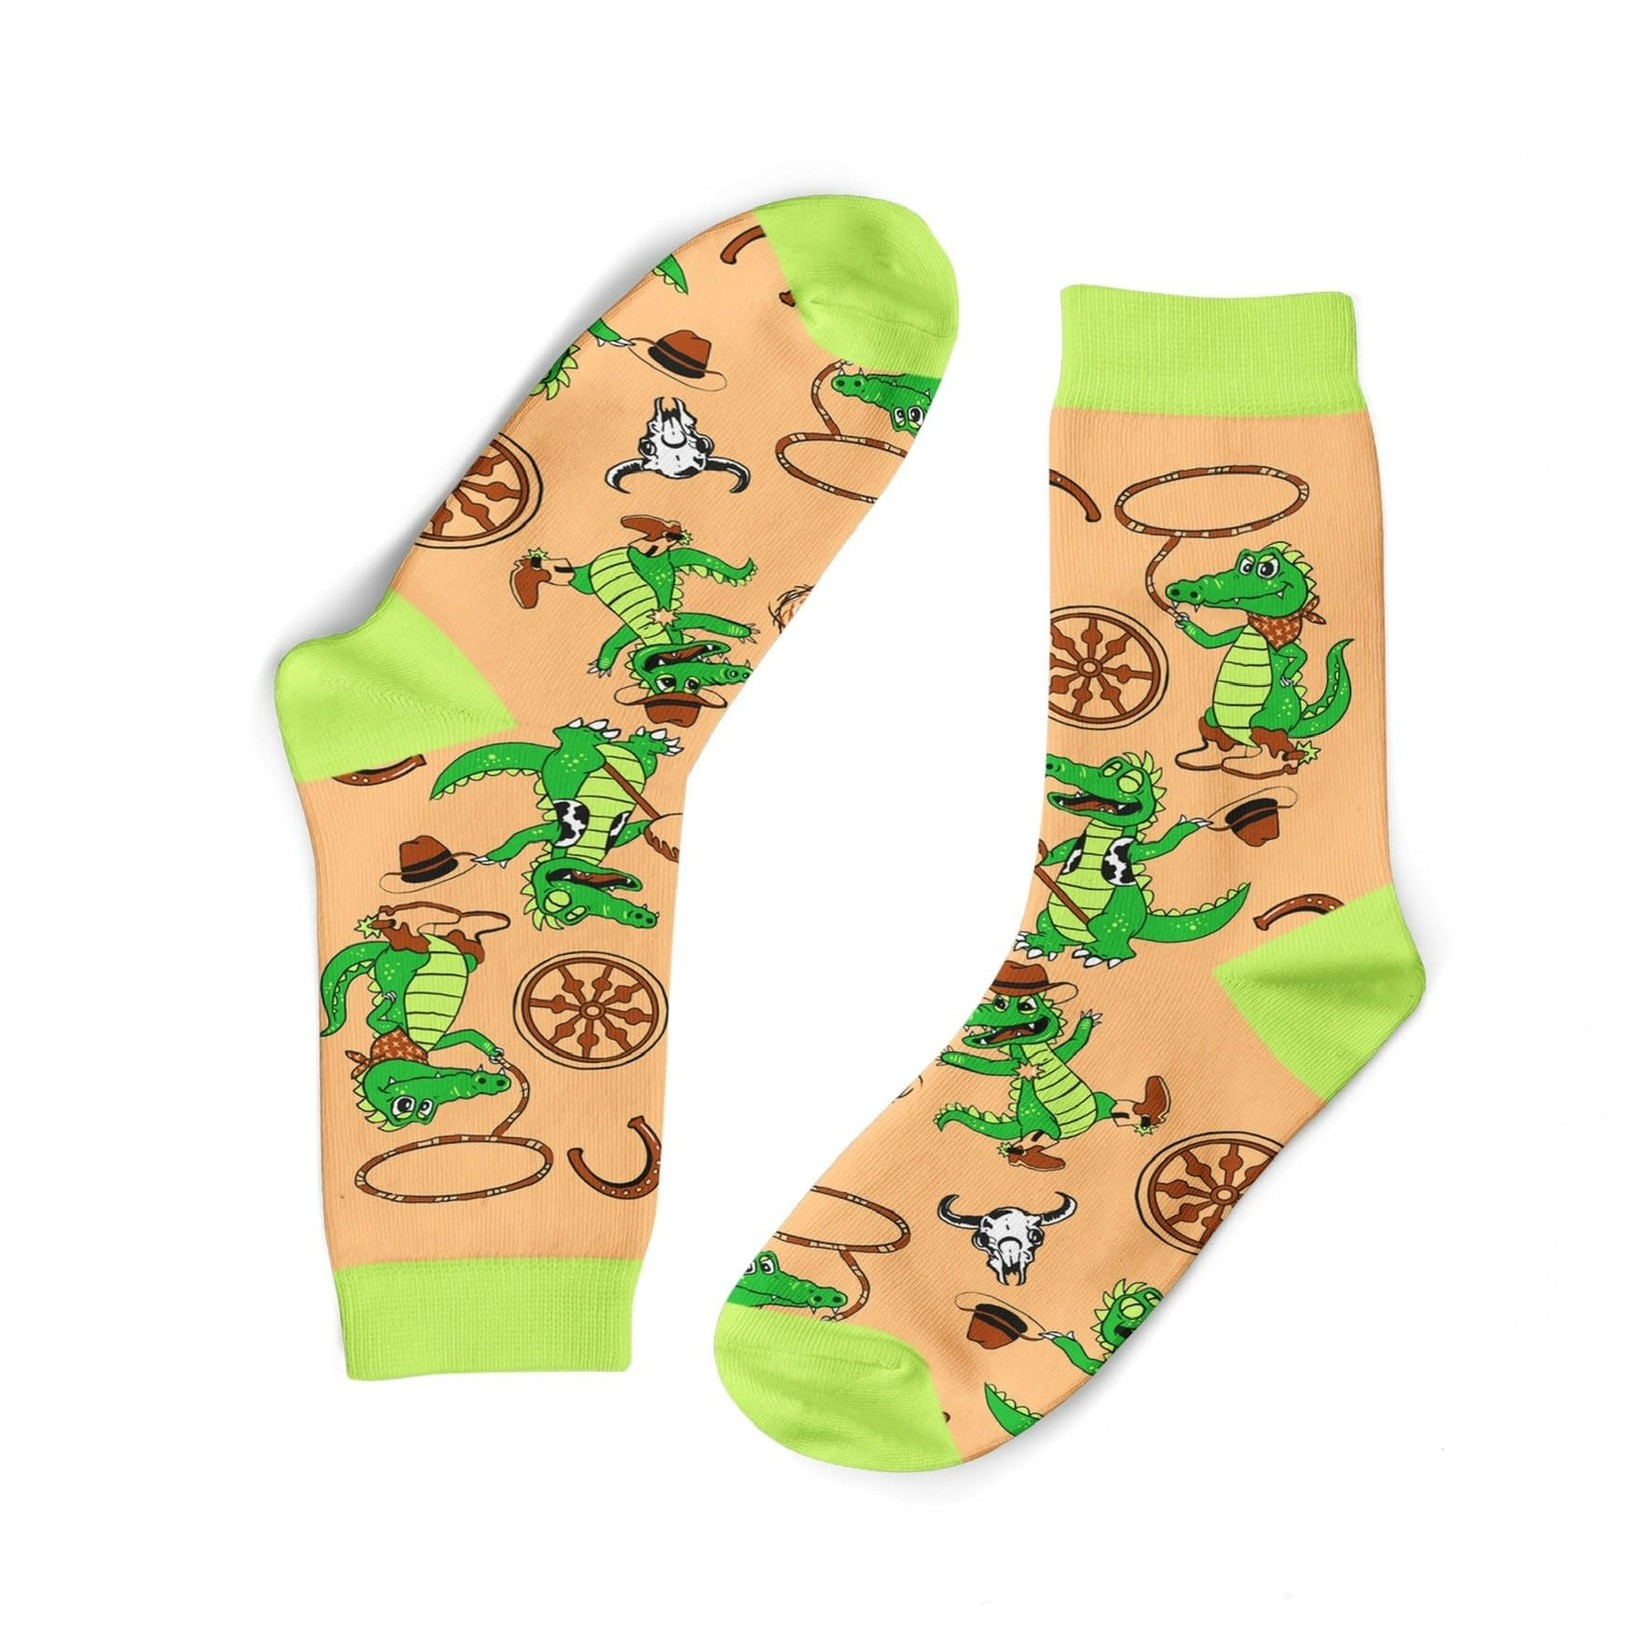 Funky Sock Co. Funky Sock Co. Bamboo Socks Cowboy Crocodiles